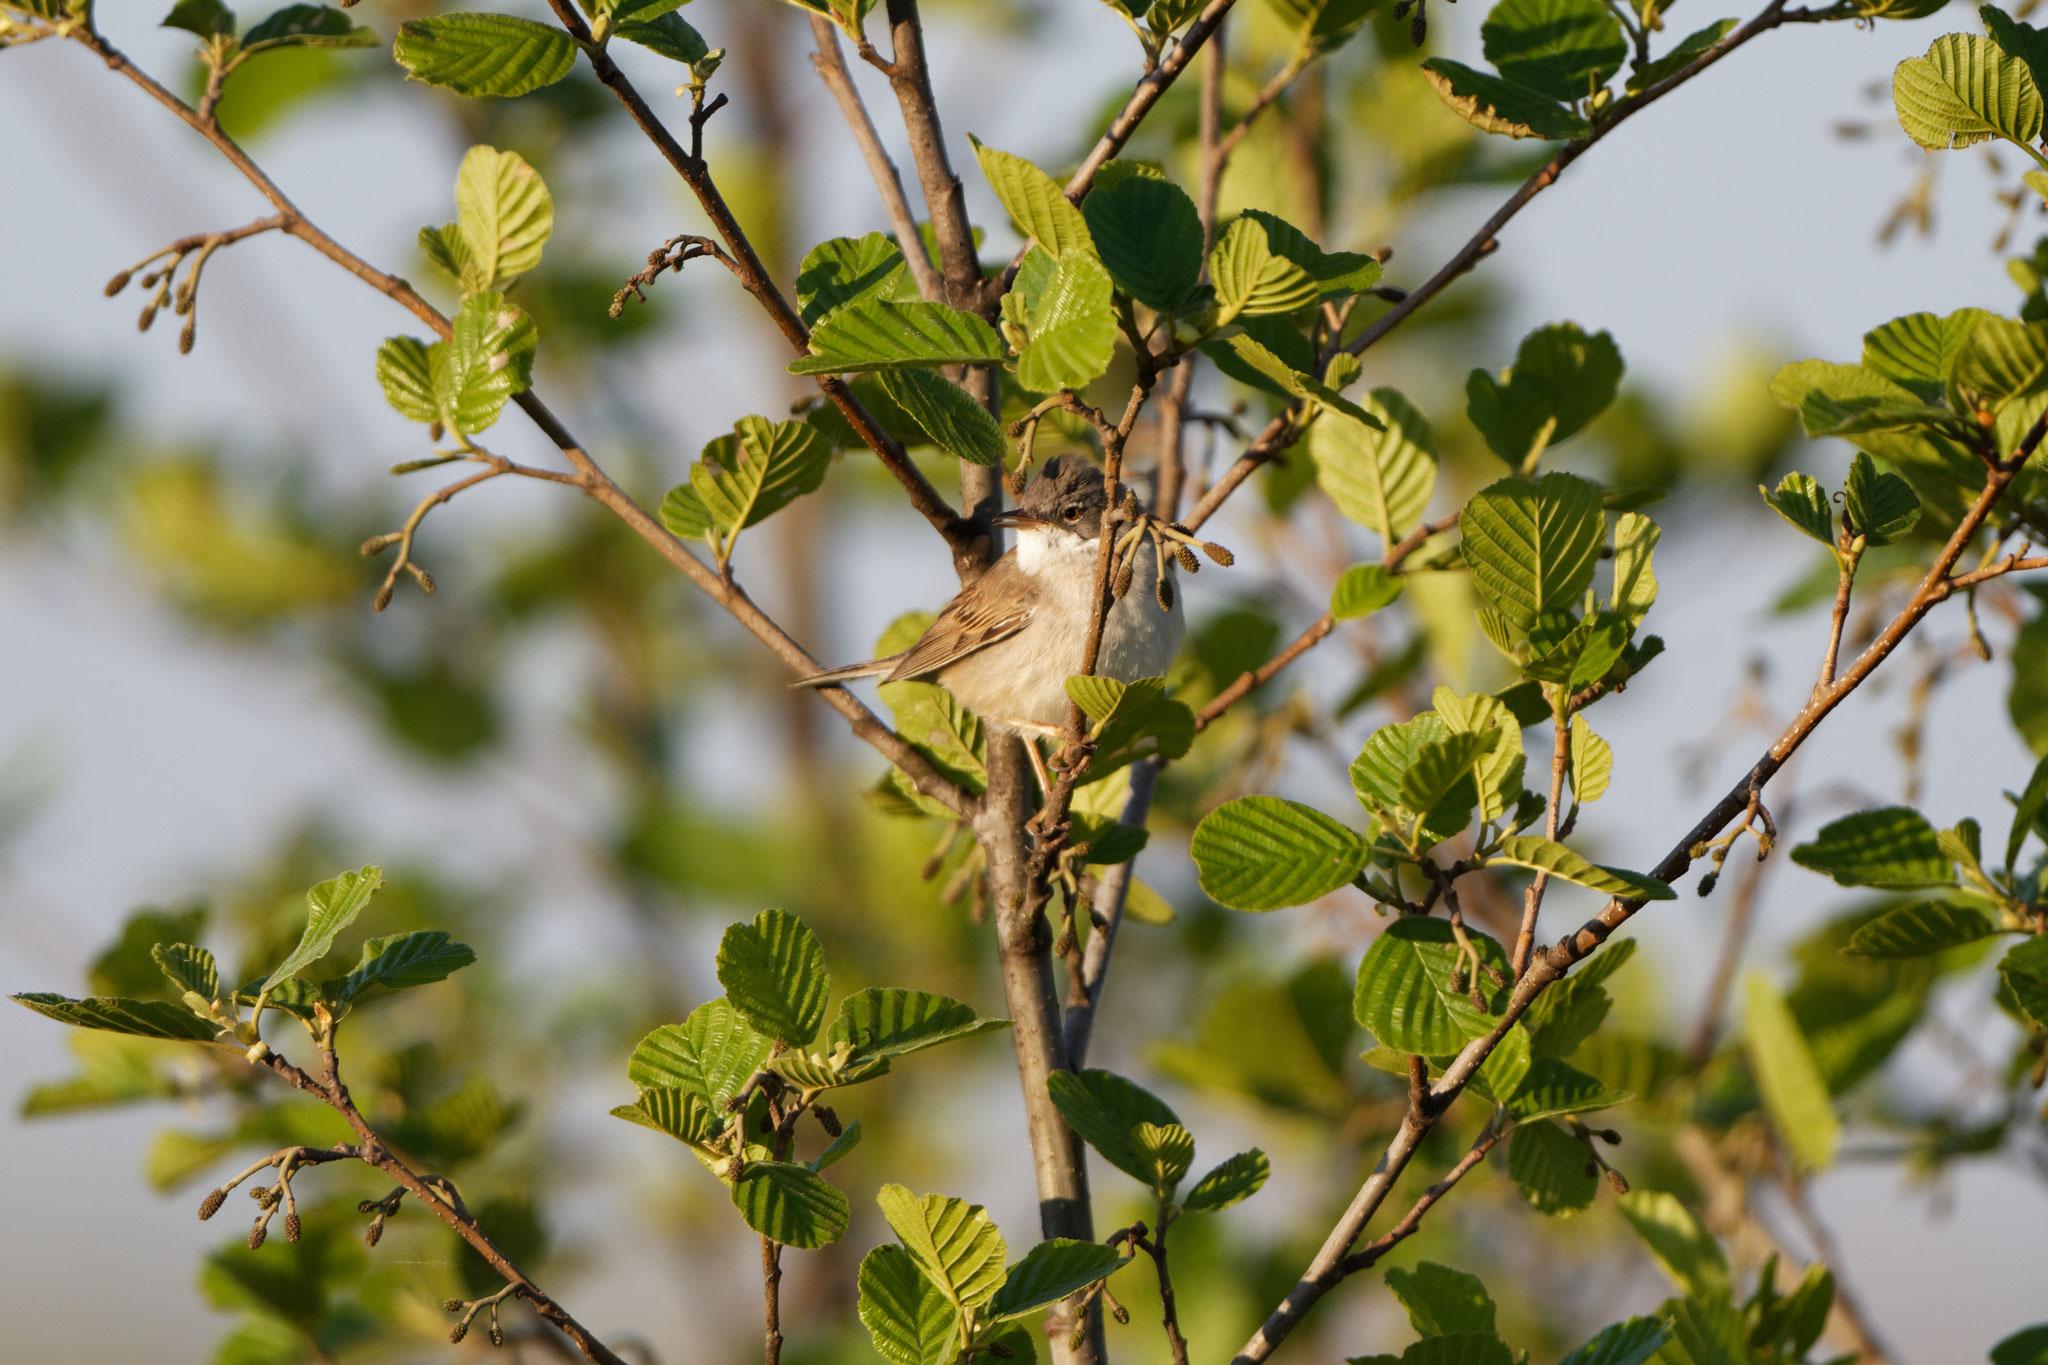 Dorngrasmücke (NABU-Bilddatenbank)